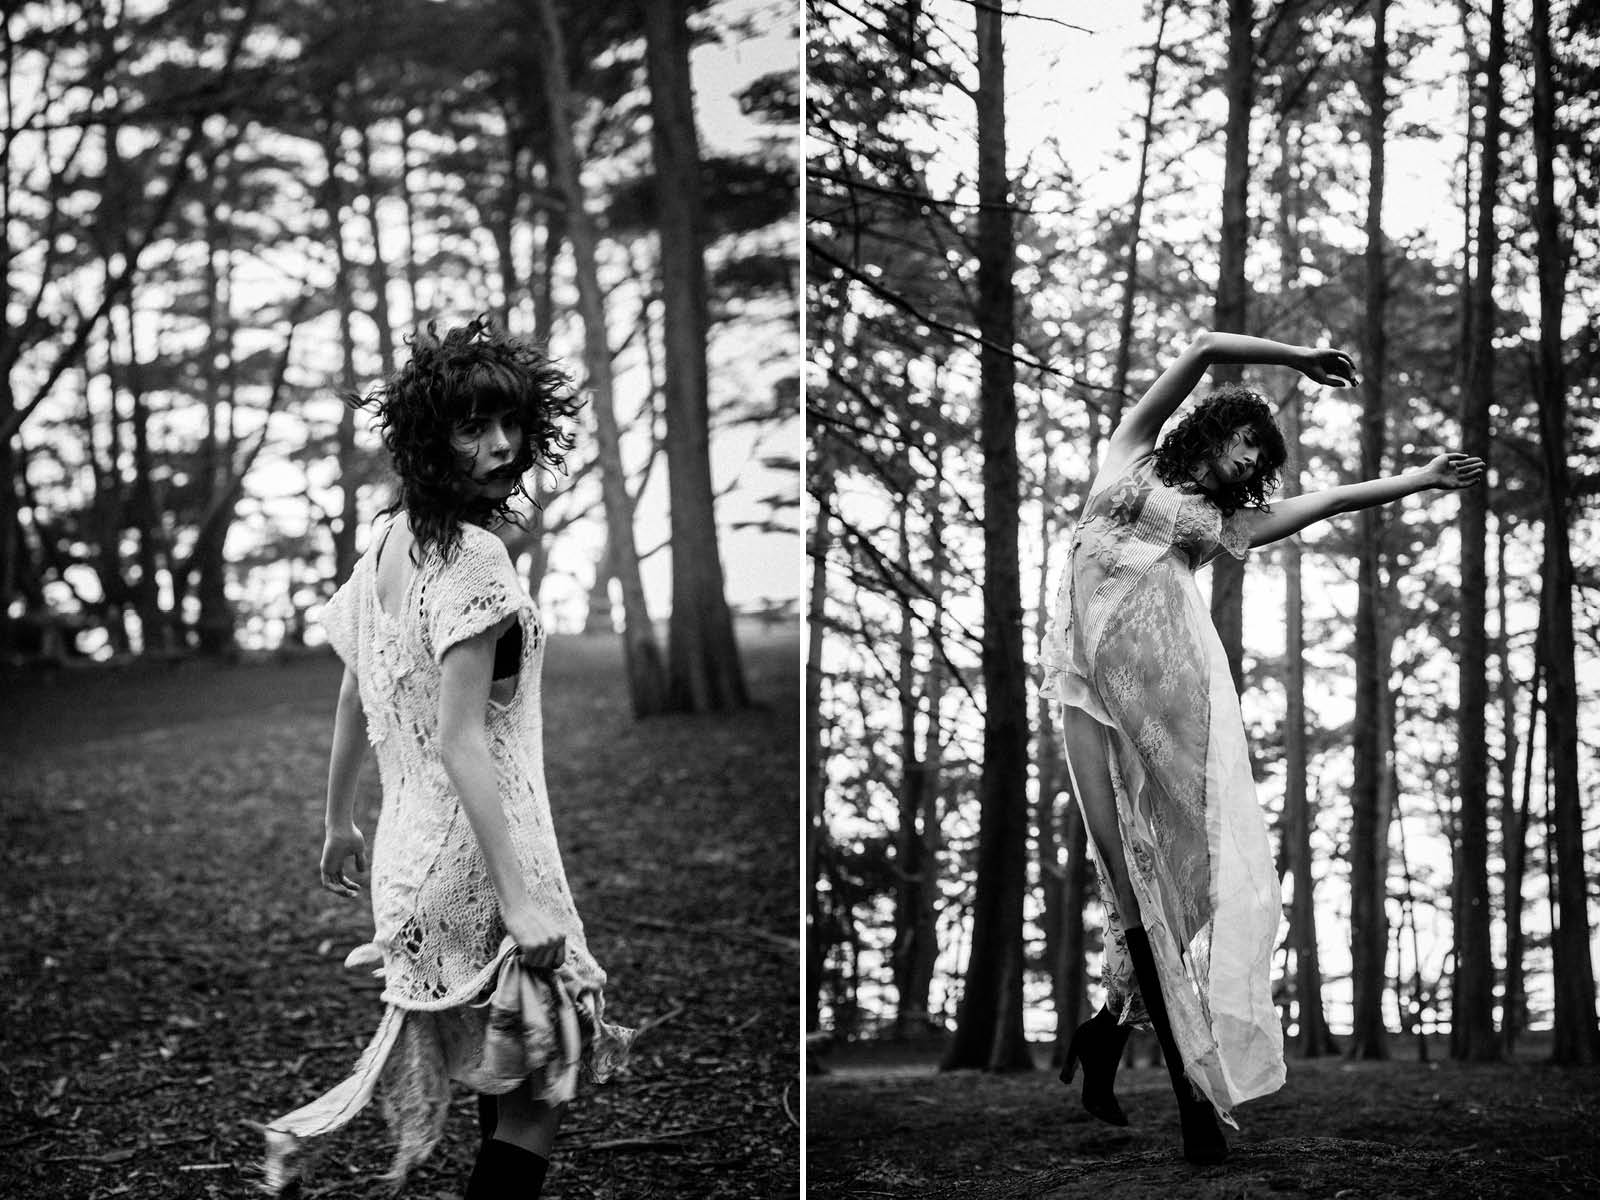 Spirit-&-Fles_MAGYARUL-DANCE_by_Matt-Licari_3